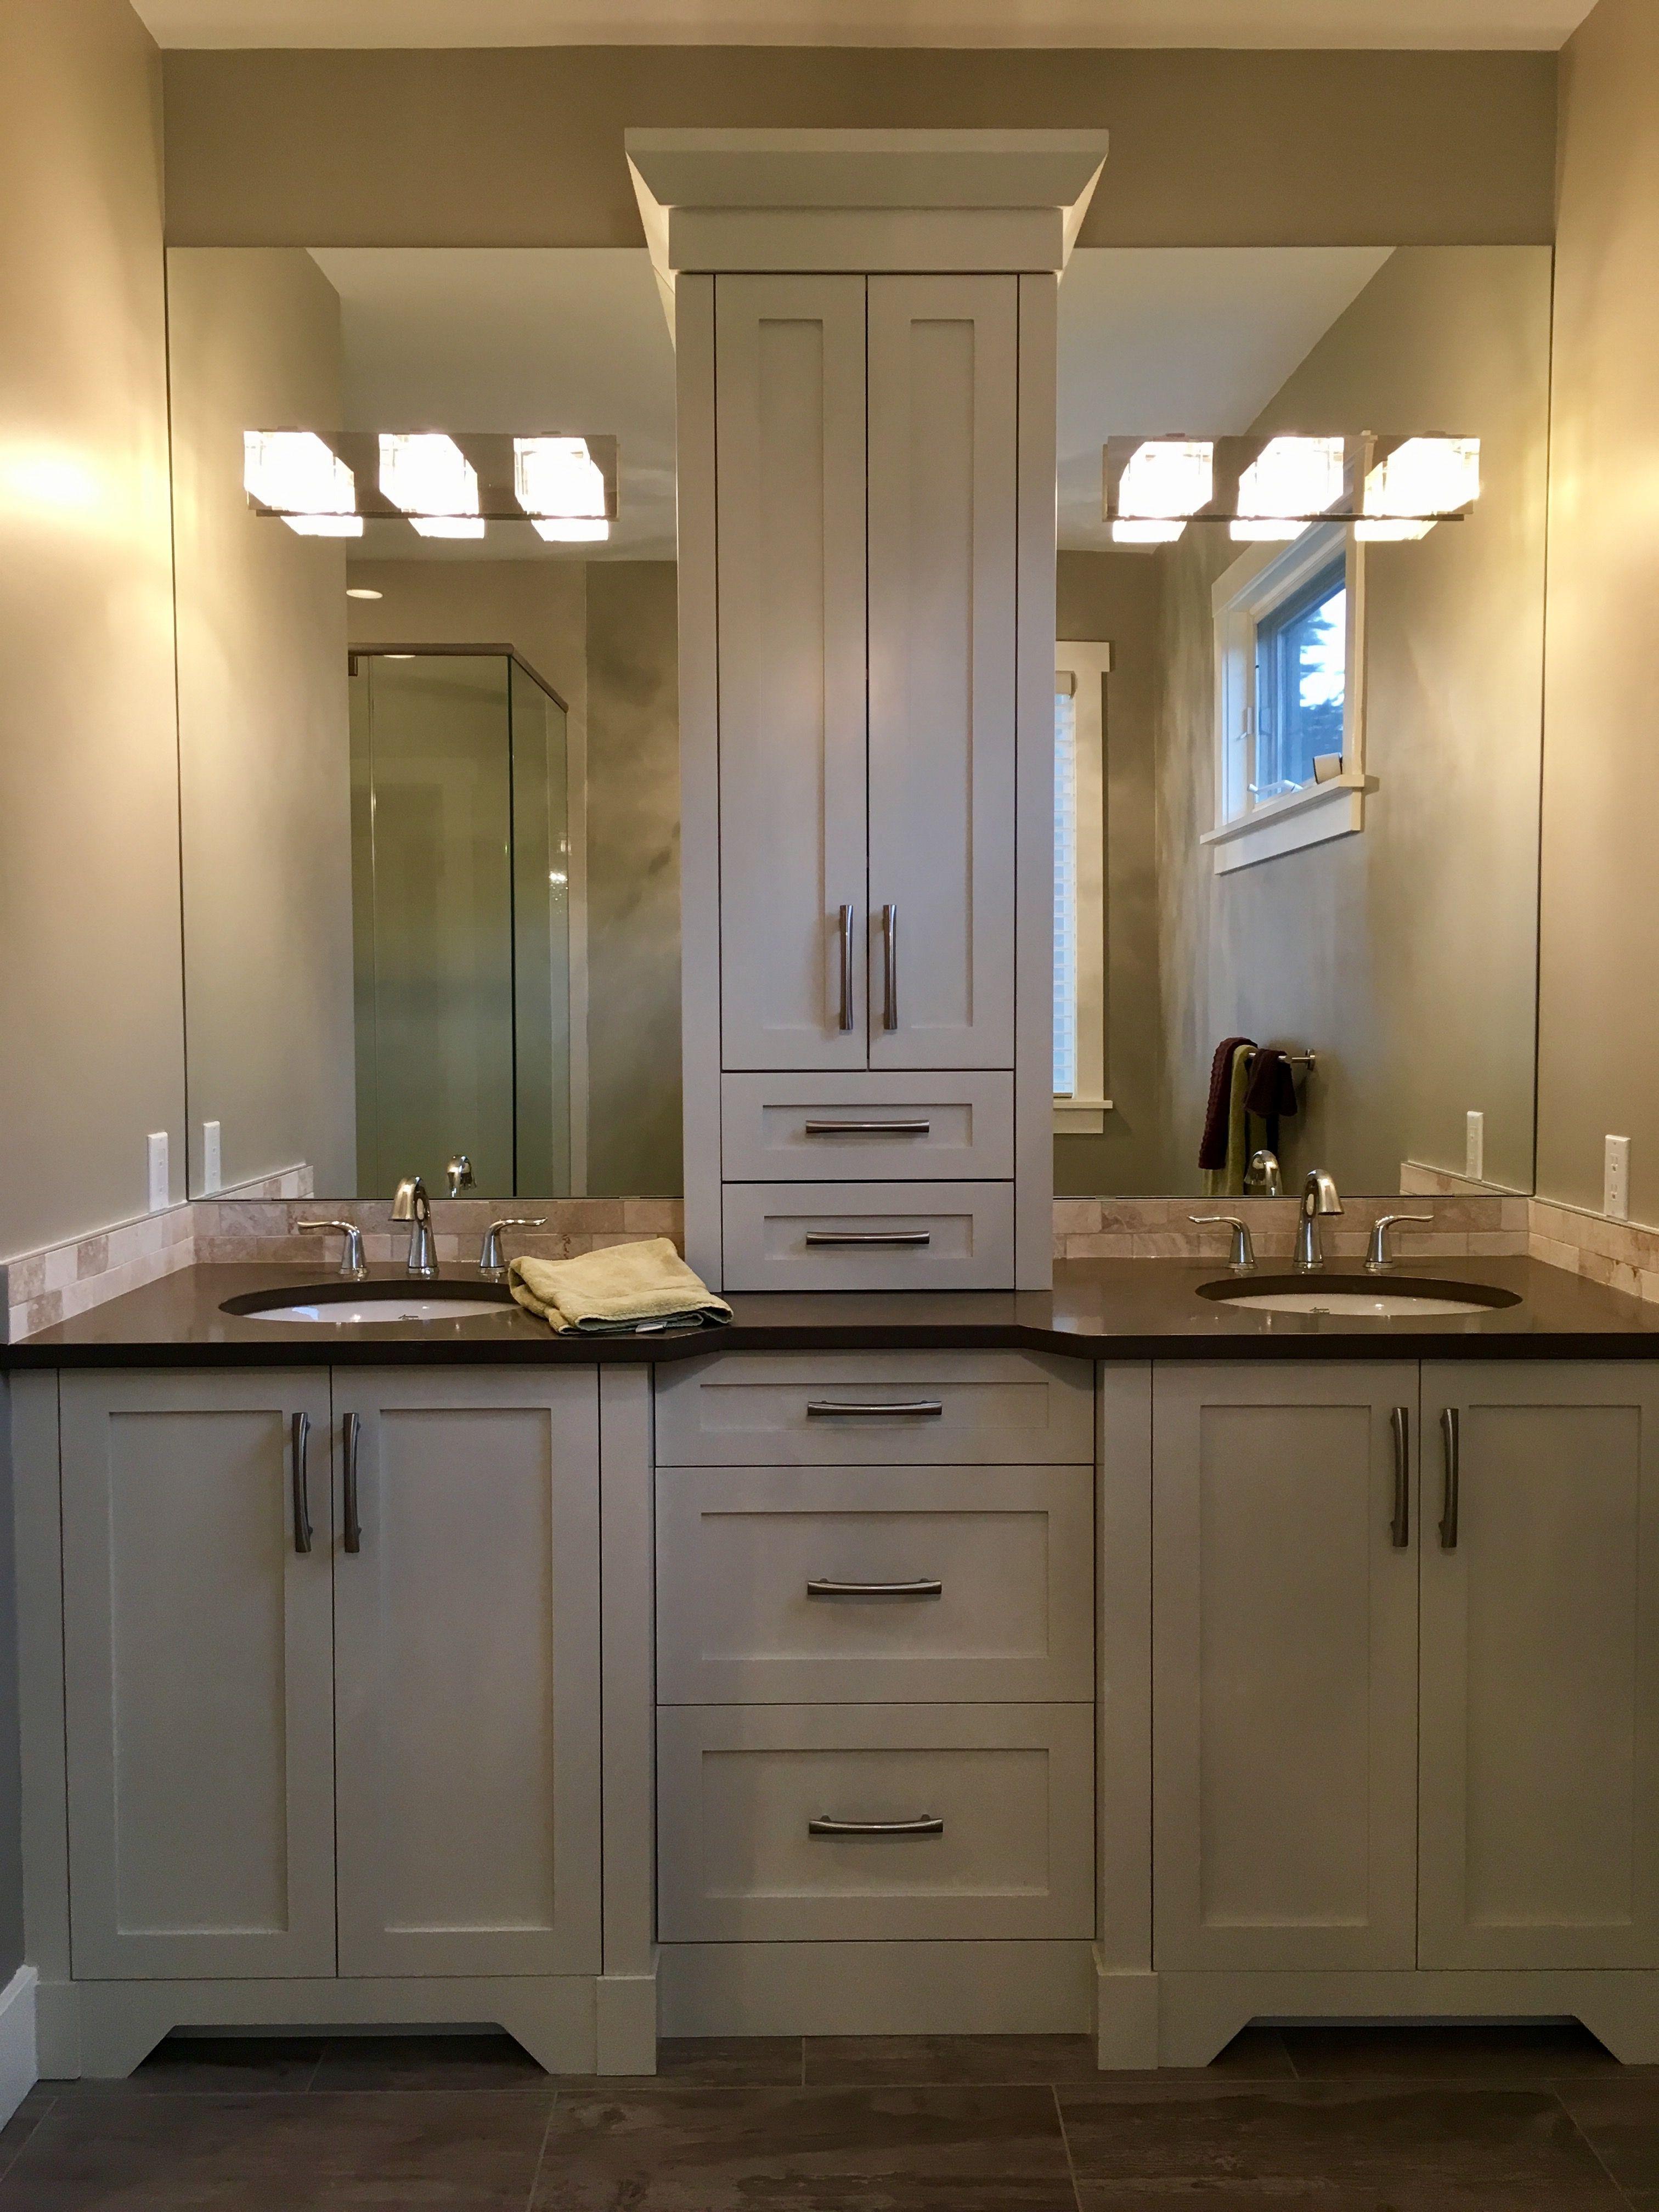 Double Sink Vanity With Crown Moulding And Centre Tower Bathroom Interior Farmhouse Bathroom Decor Bathroom Vanity Remodel